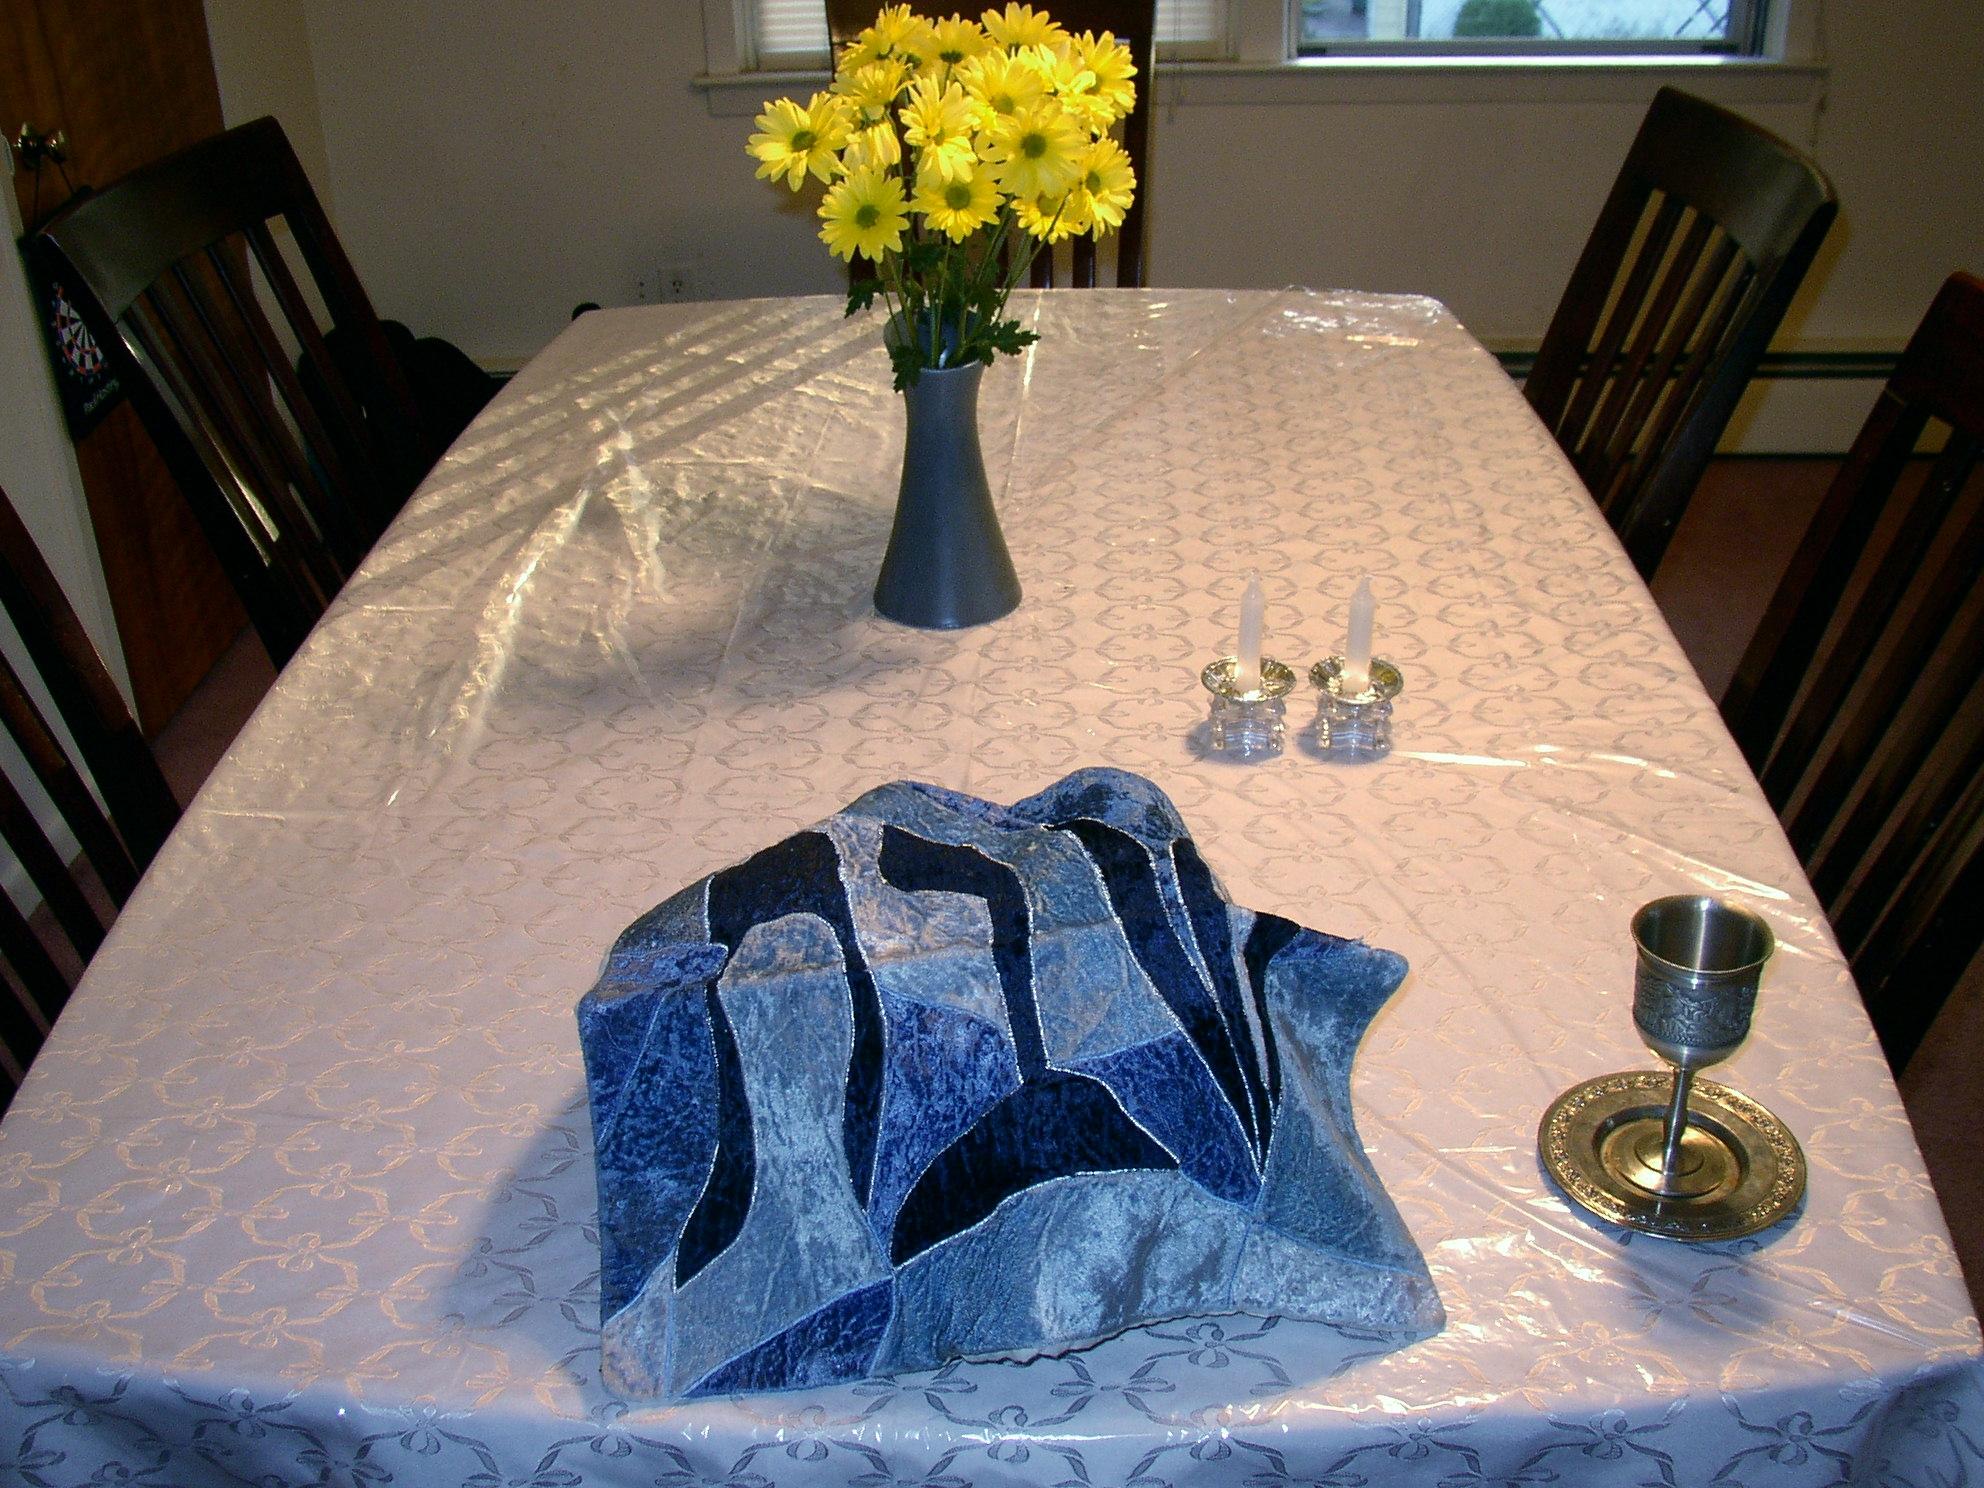 FileShabbat table setting.jpg & File:Shabbat table setting.jpg - Wikimedia Commons